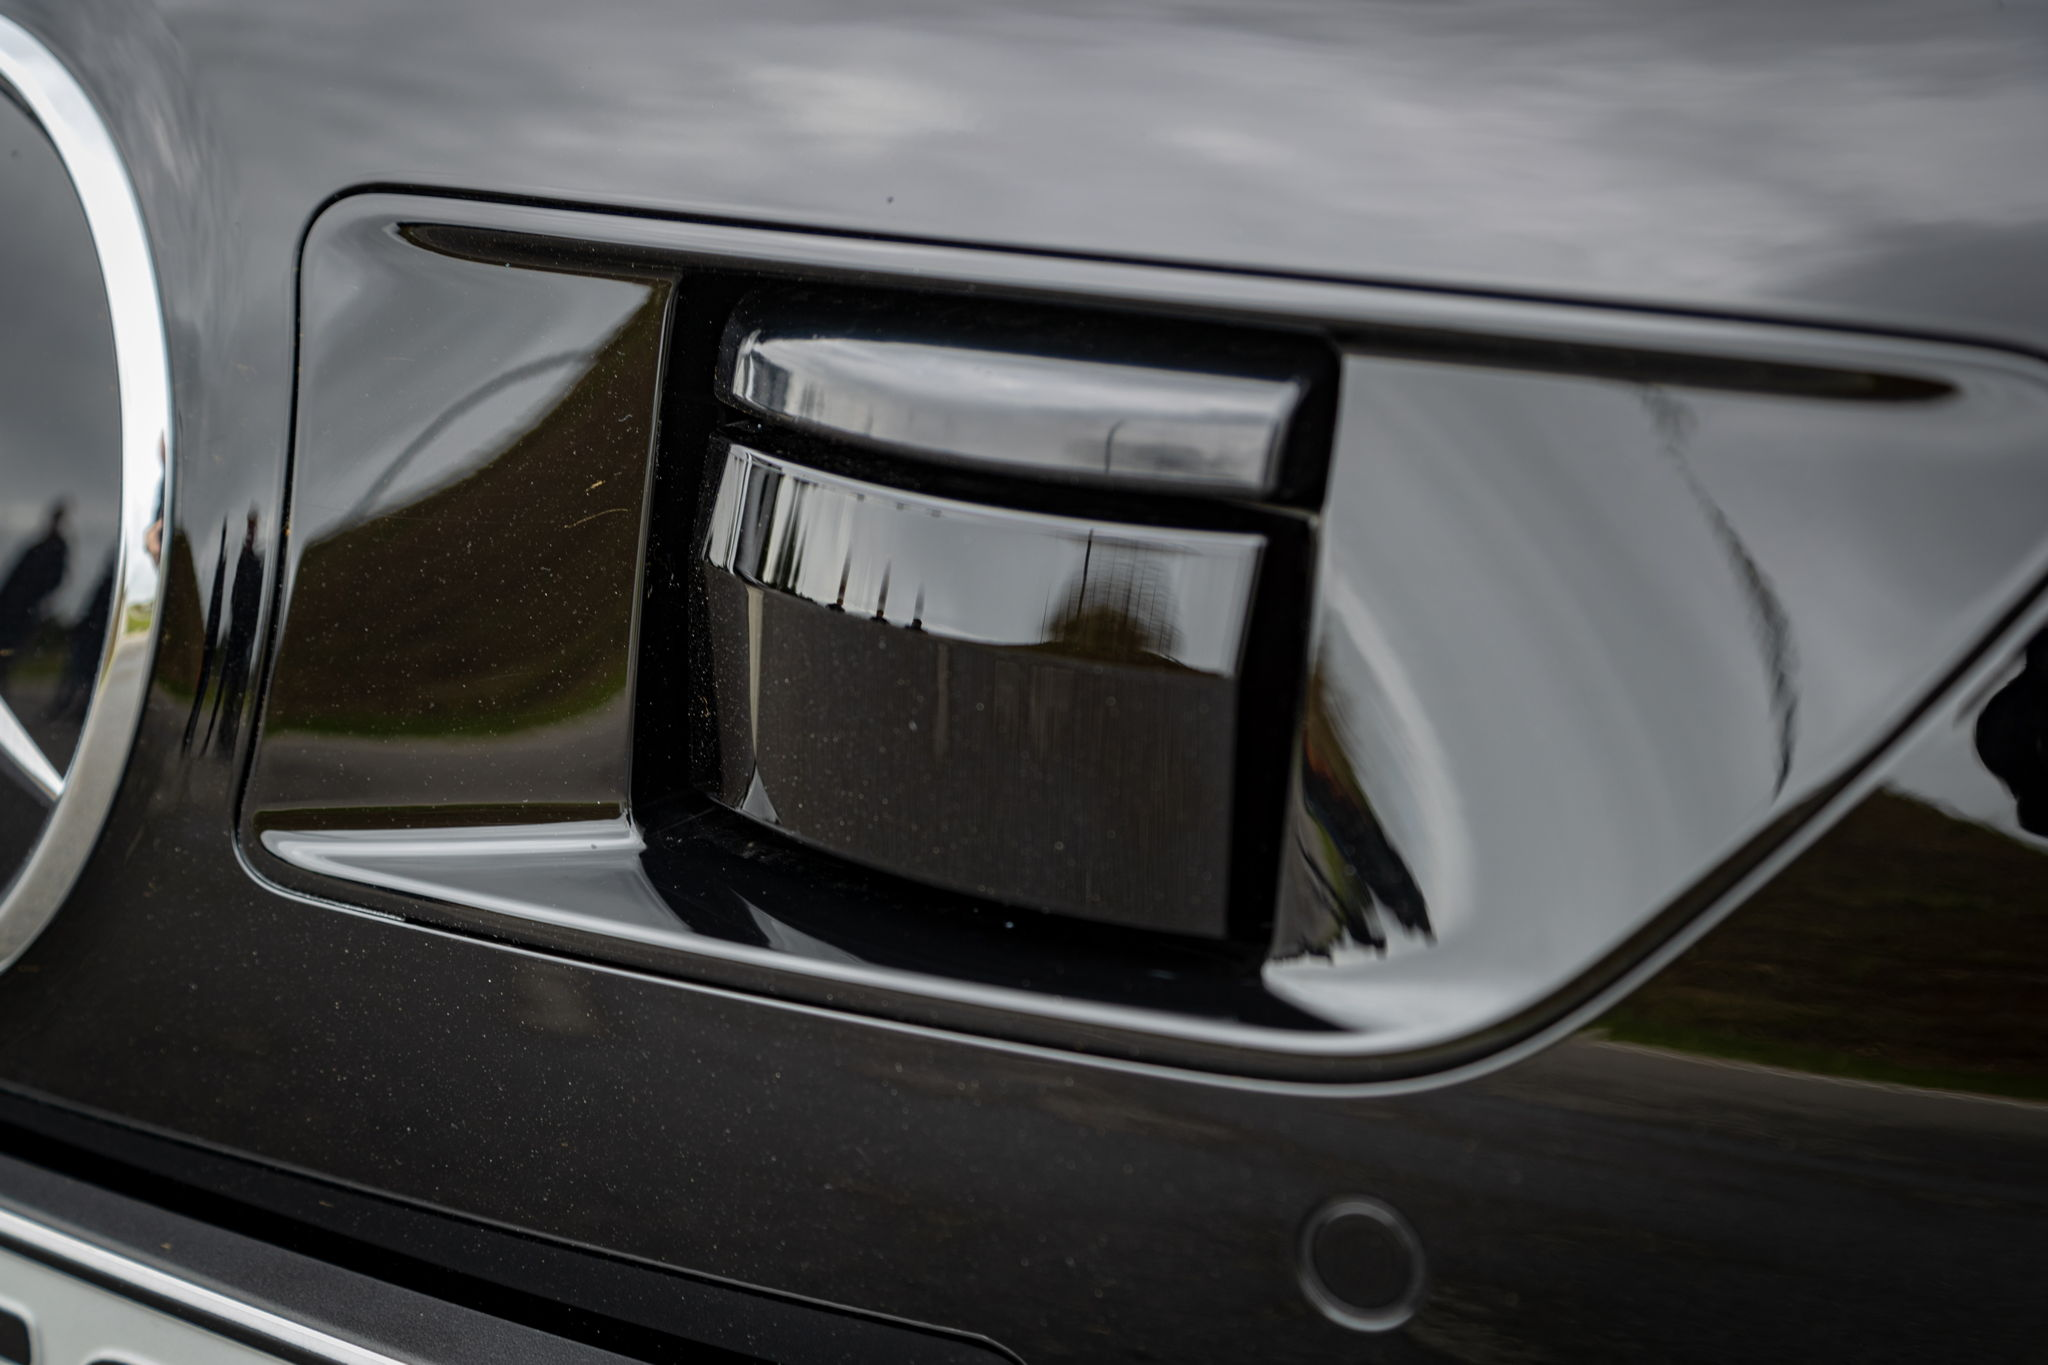 Mercedes-Benz EQS kommt erst ab 2022 mit Level 3 Drive Pilot